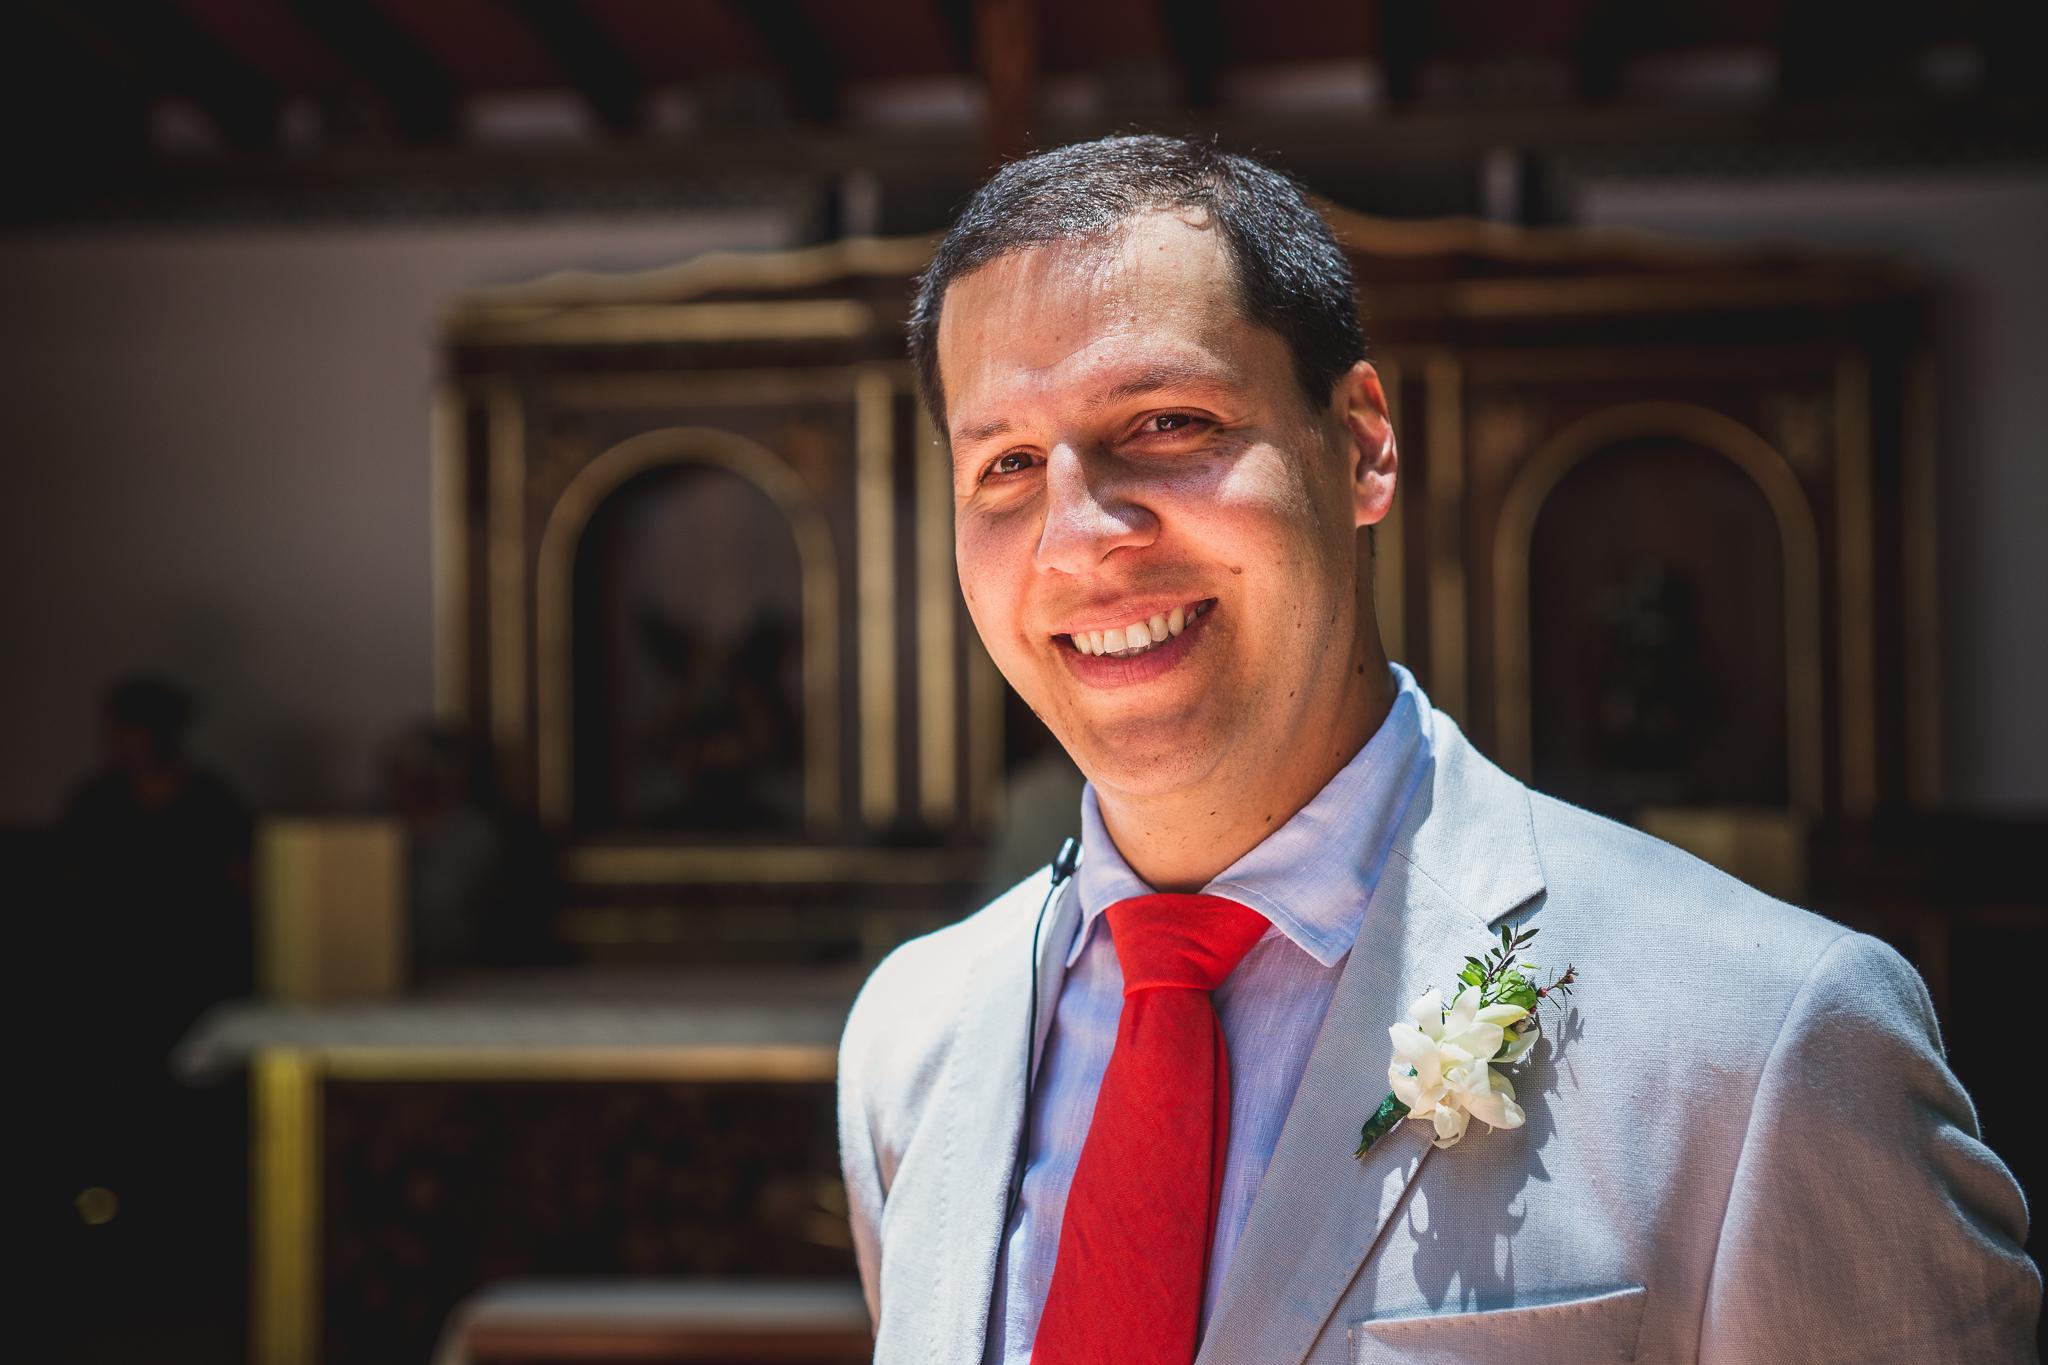 wedding-photography-mexico-quinta-rubelinas-36.jpg